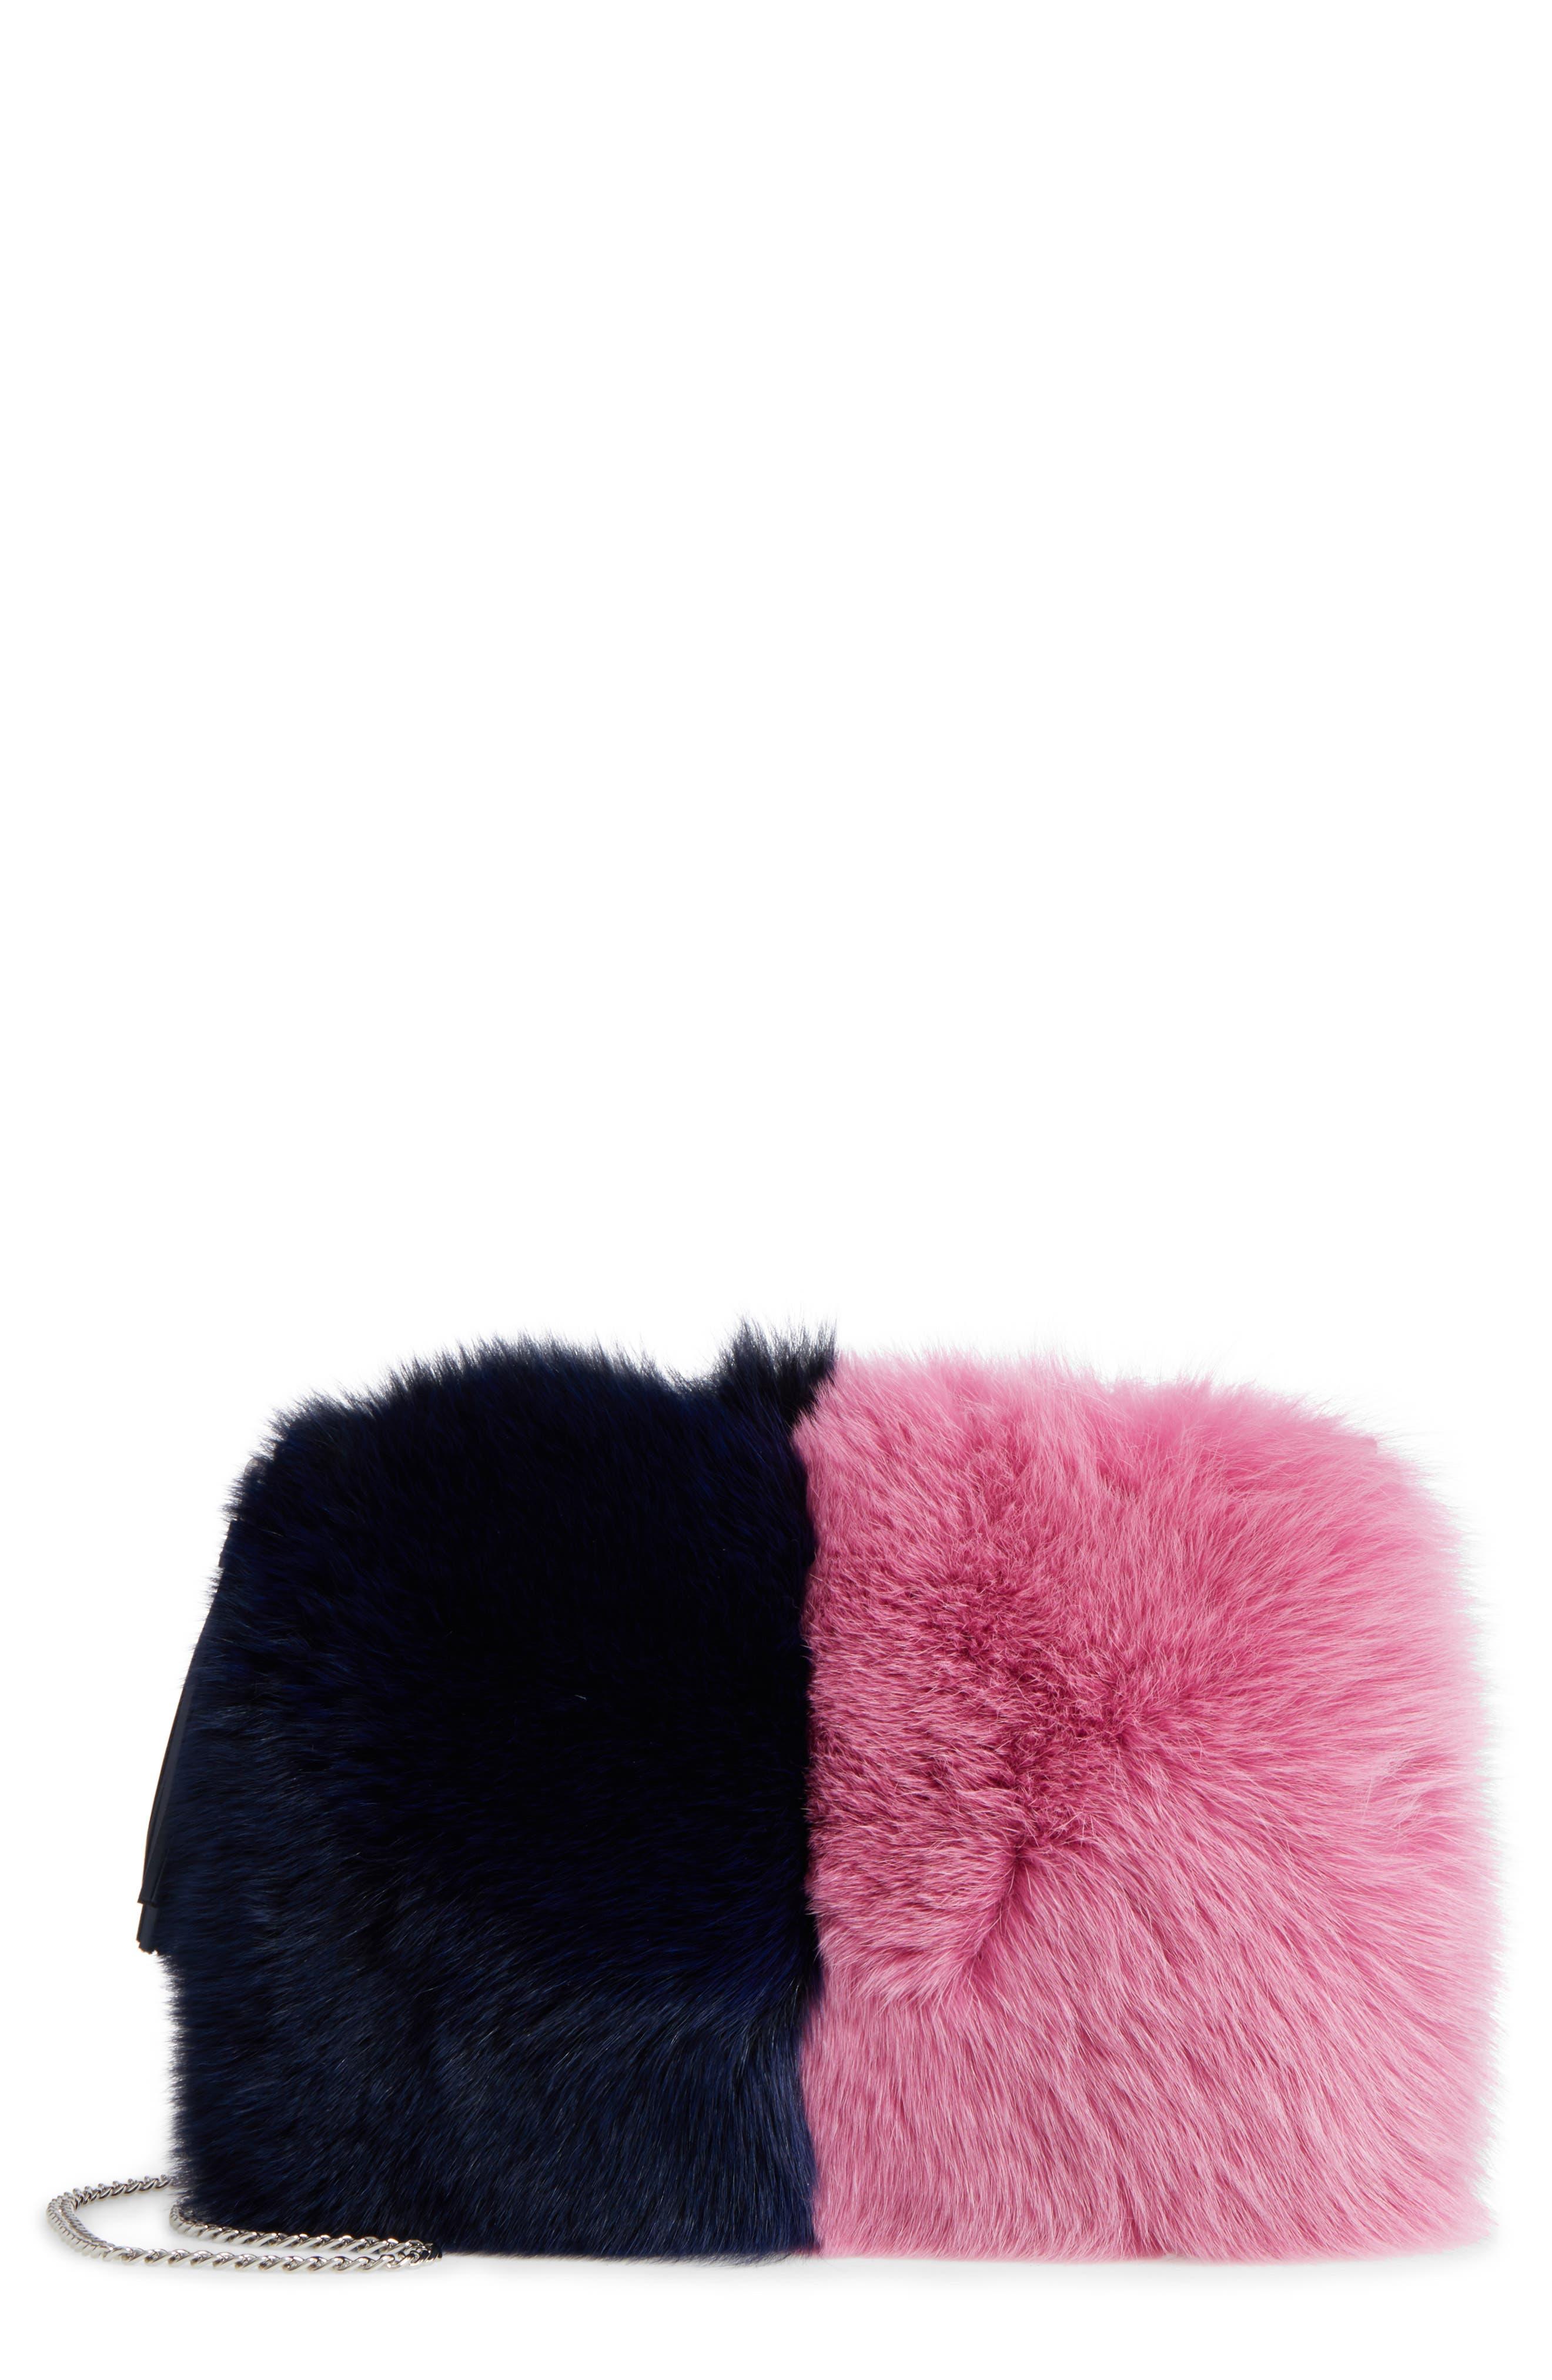 Genuine Fox Fur Tassel Pouch,                             Main thumbnail 1, color,                             Eclipse/ Hot Pink